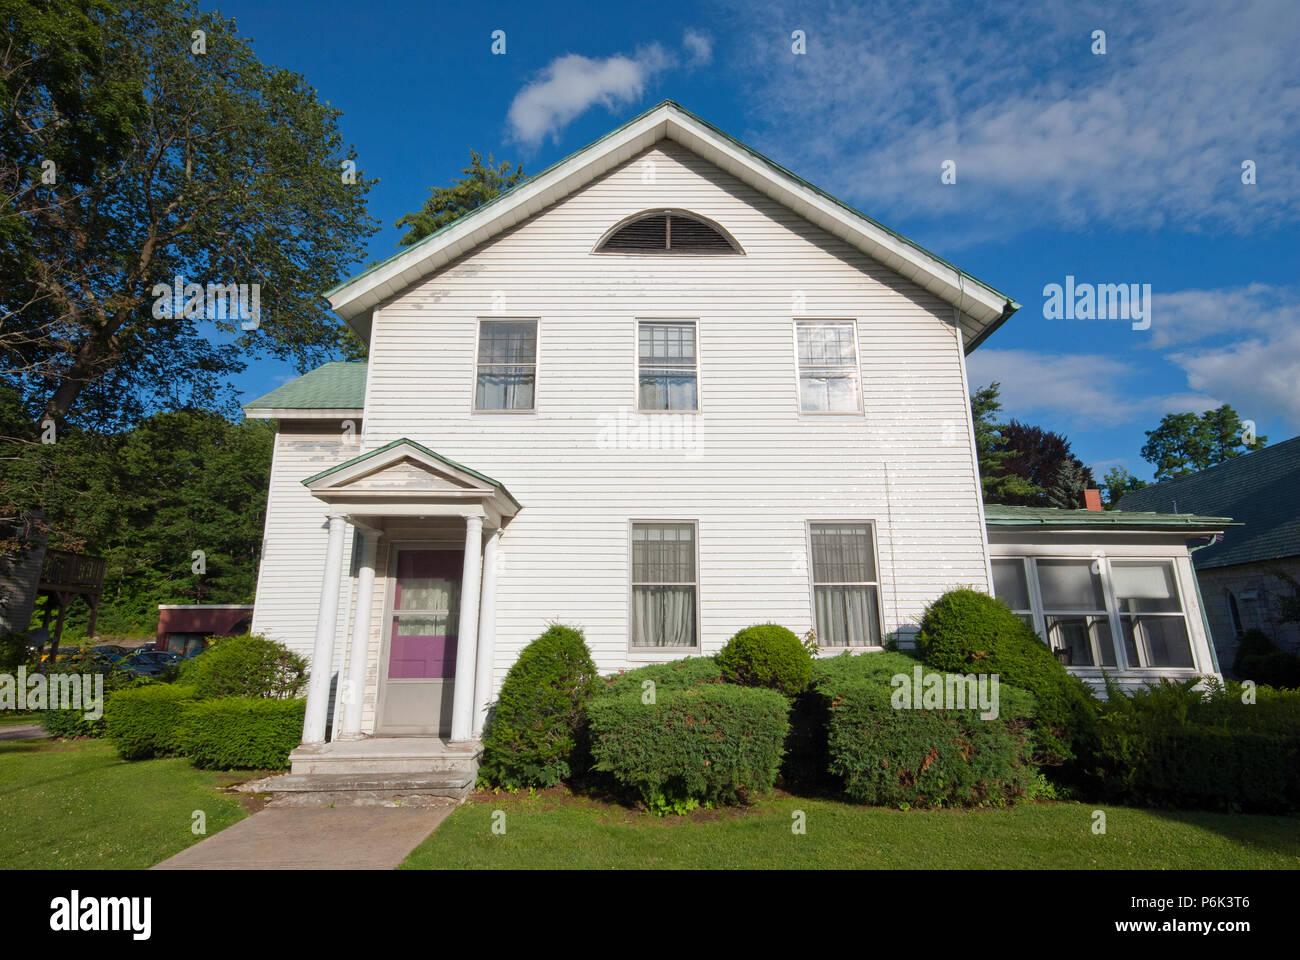 House in Stockbridge, Berkshire County, Massachusetts, USA - Stock Image